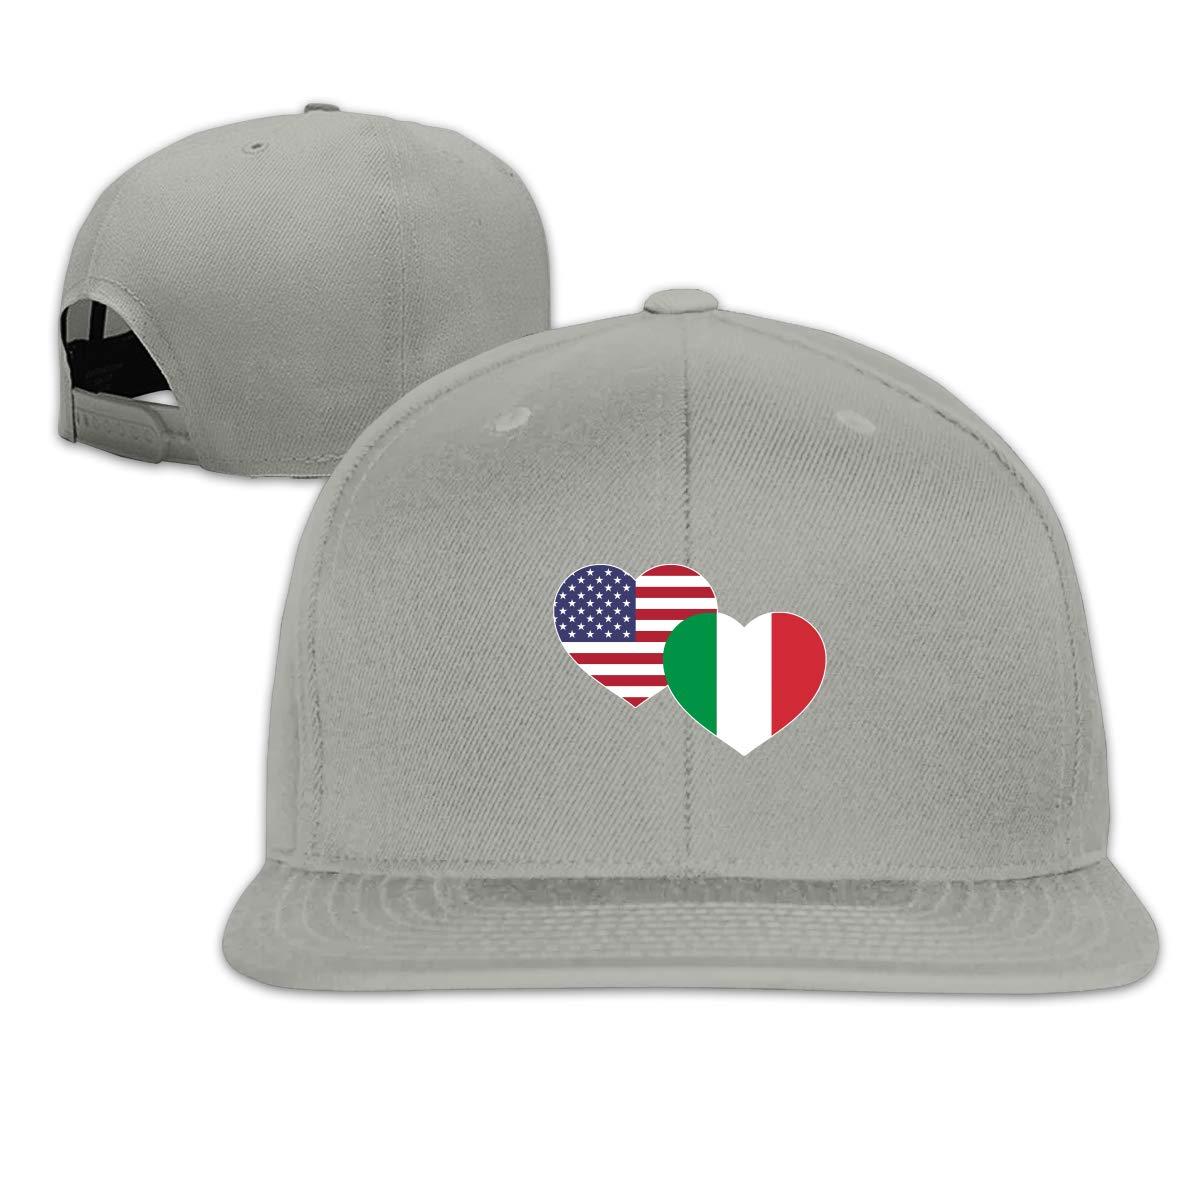 MOCSTONE Unisex Snapback Hat US Italian Flag Heart Adjustable Baseball Cap